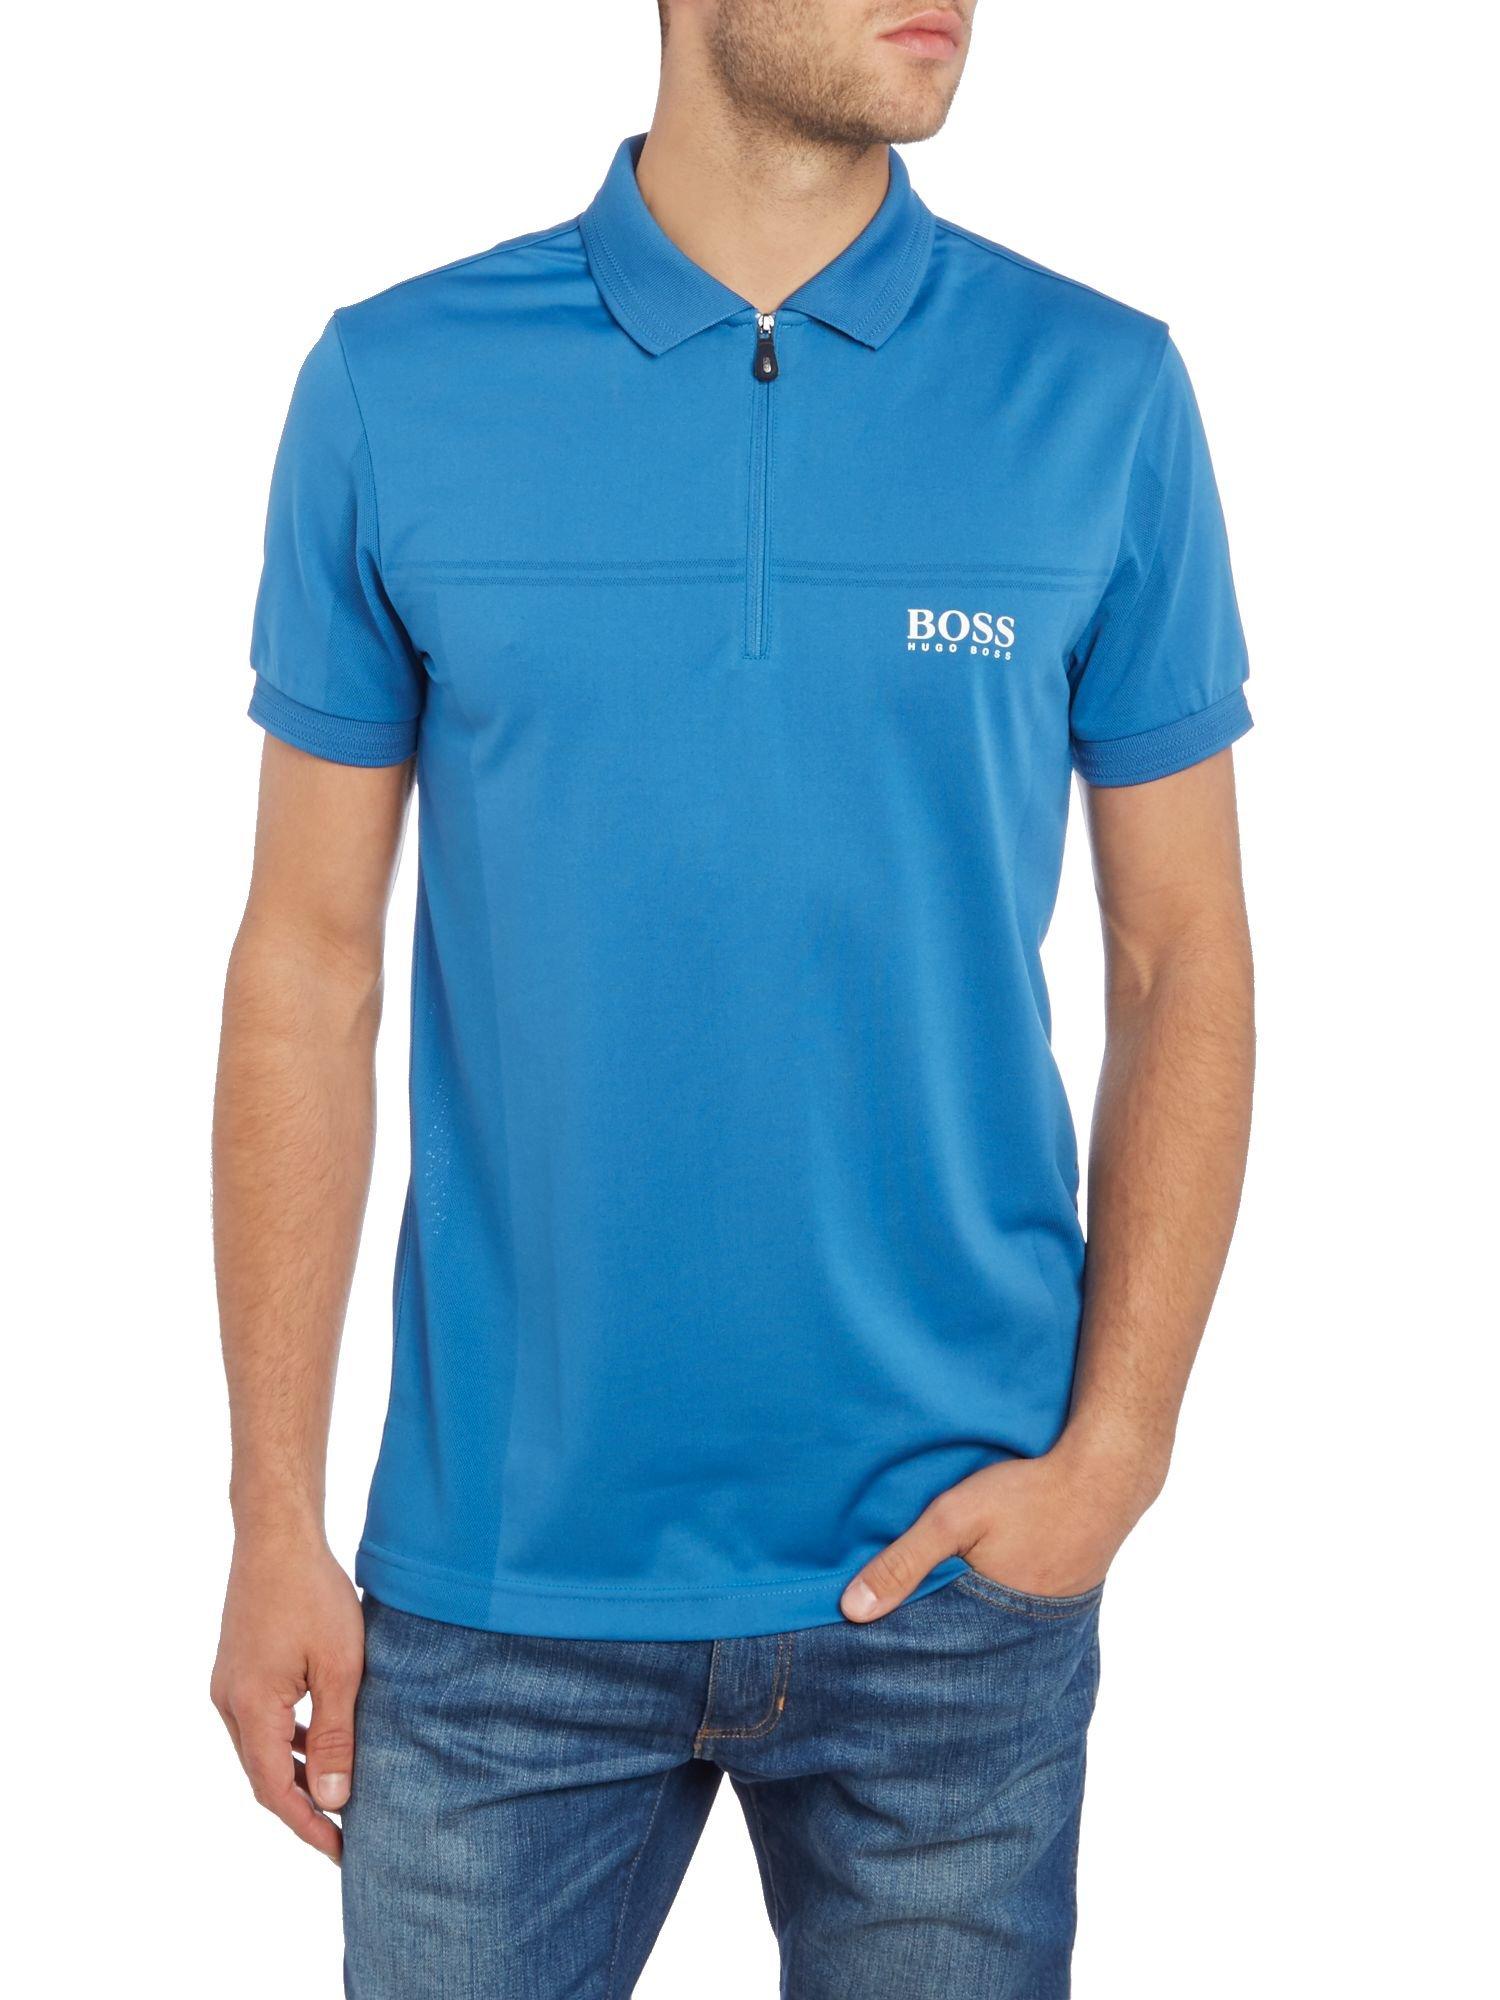 1f06ef12 ... Paule Pro 2 Navy Clothing Source · Discount Hugo Boss Golf Shirts